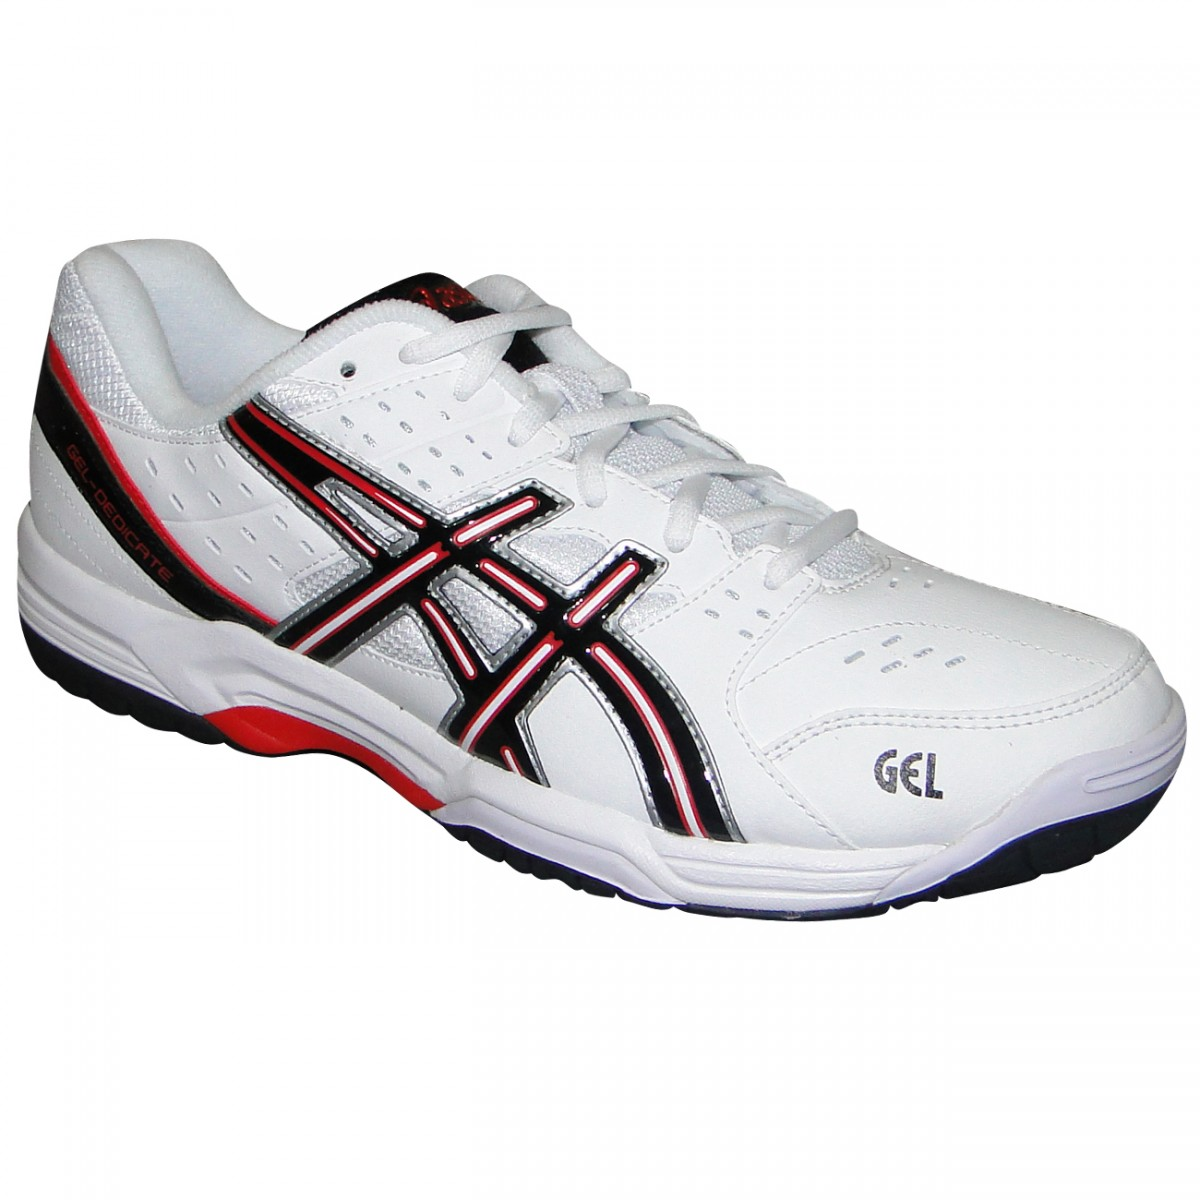 Tenis Asics Gel-Dedicate 3 E308Y 0199 - Branco Preto Vermelho ... c1faa743f06e3